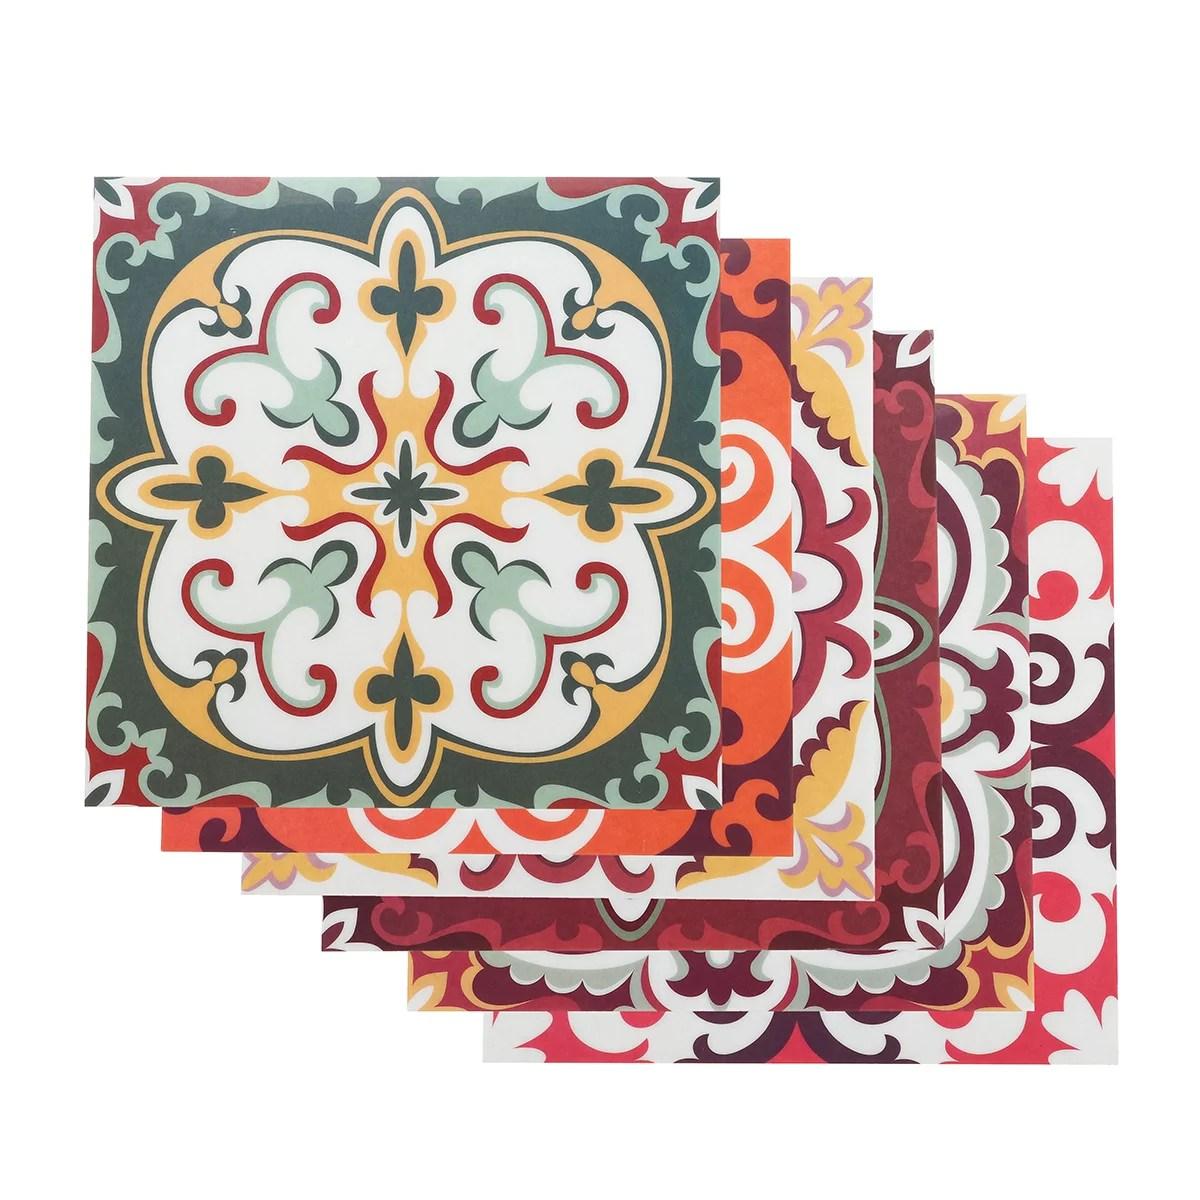 tile stickers kitchen backsplash bathroom vinyl waterproof peel and stick mexican talavera tile decal 6pcs 8 x 8